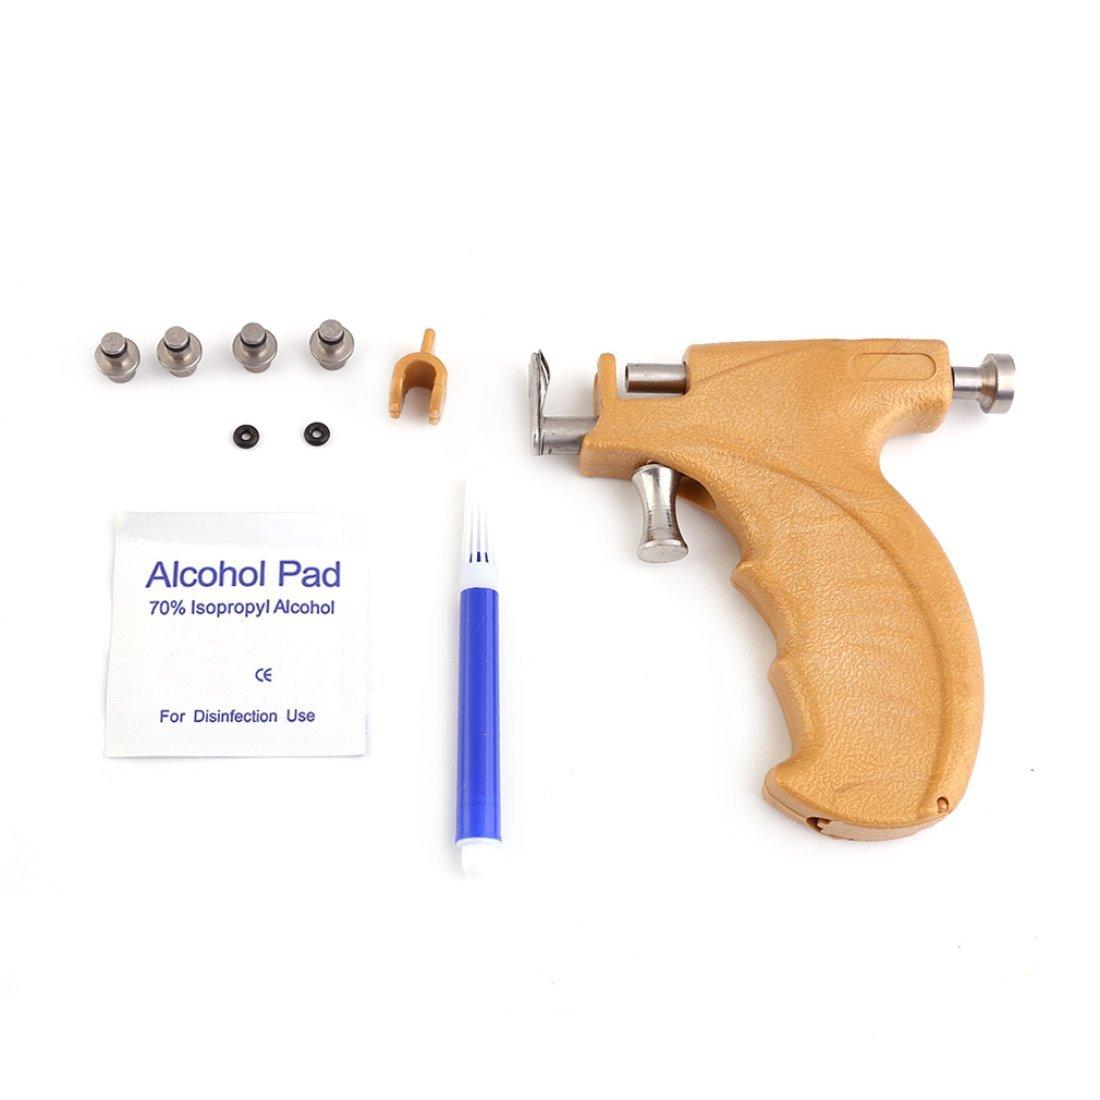 Professional Stainless Steel Ear Gun Safe Piercing Earrings Pierced Earrings In Painless Tool Beauty Accessories